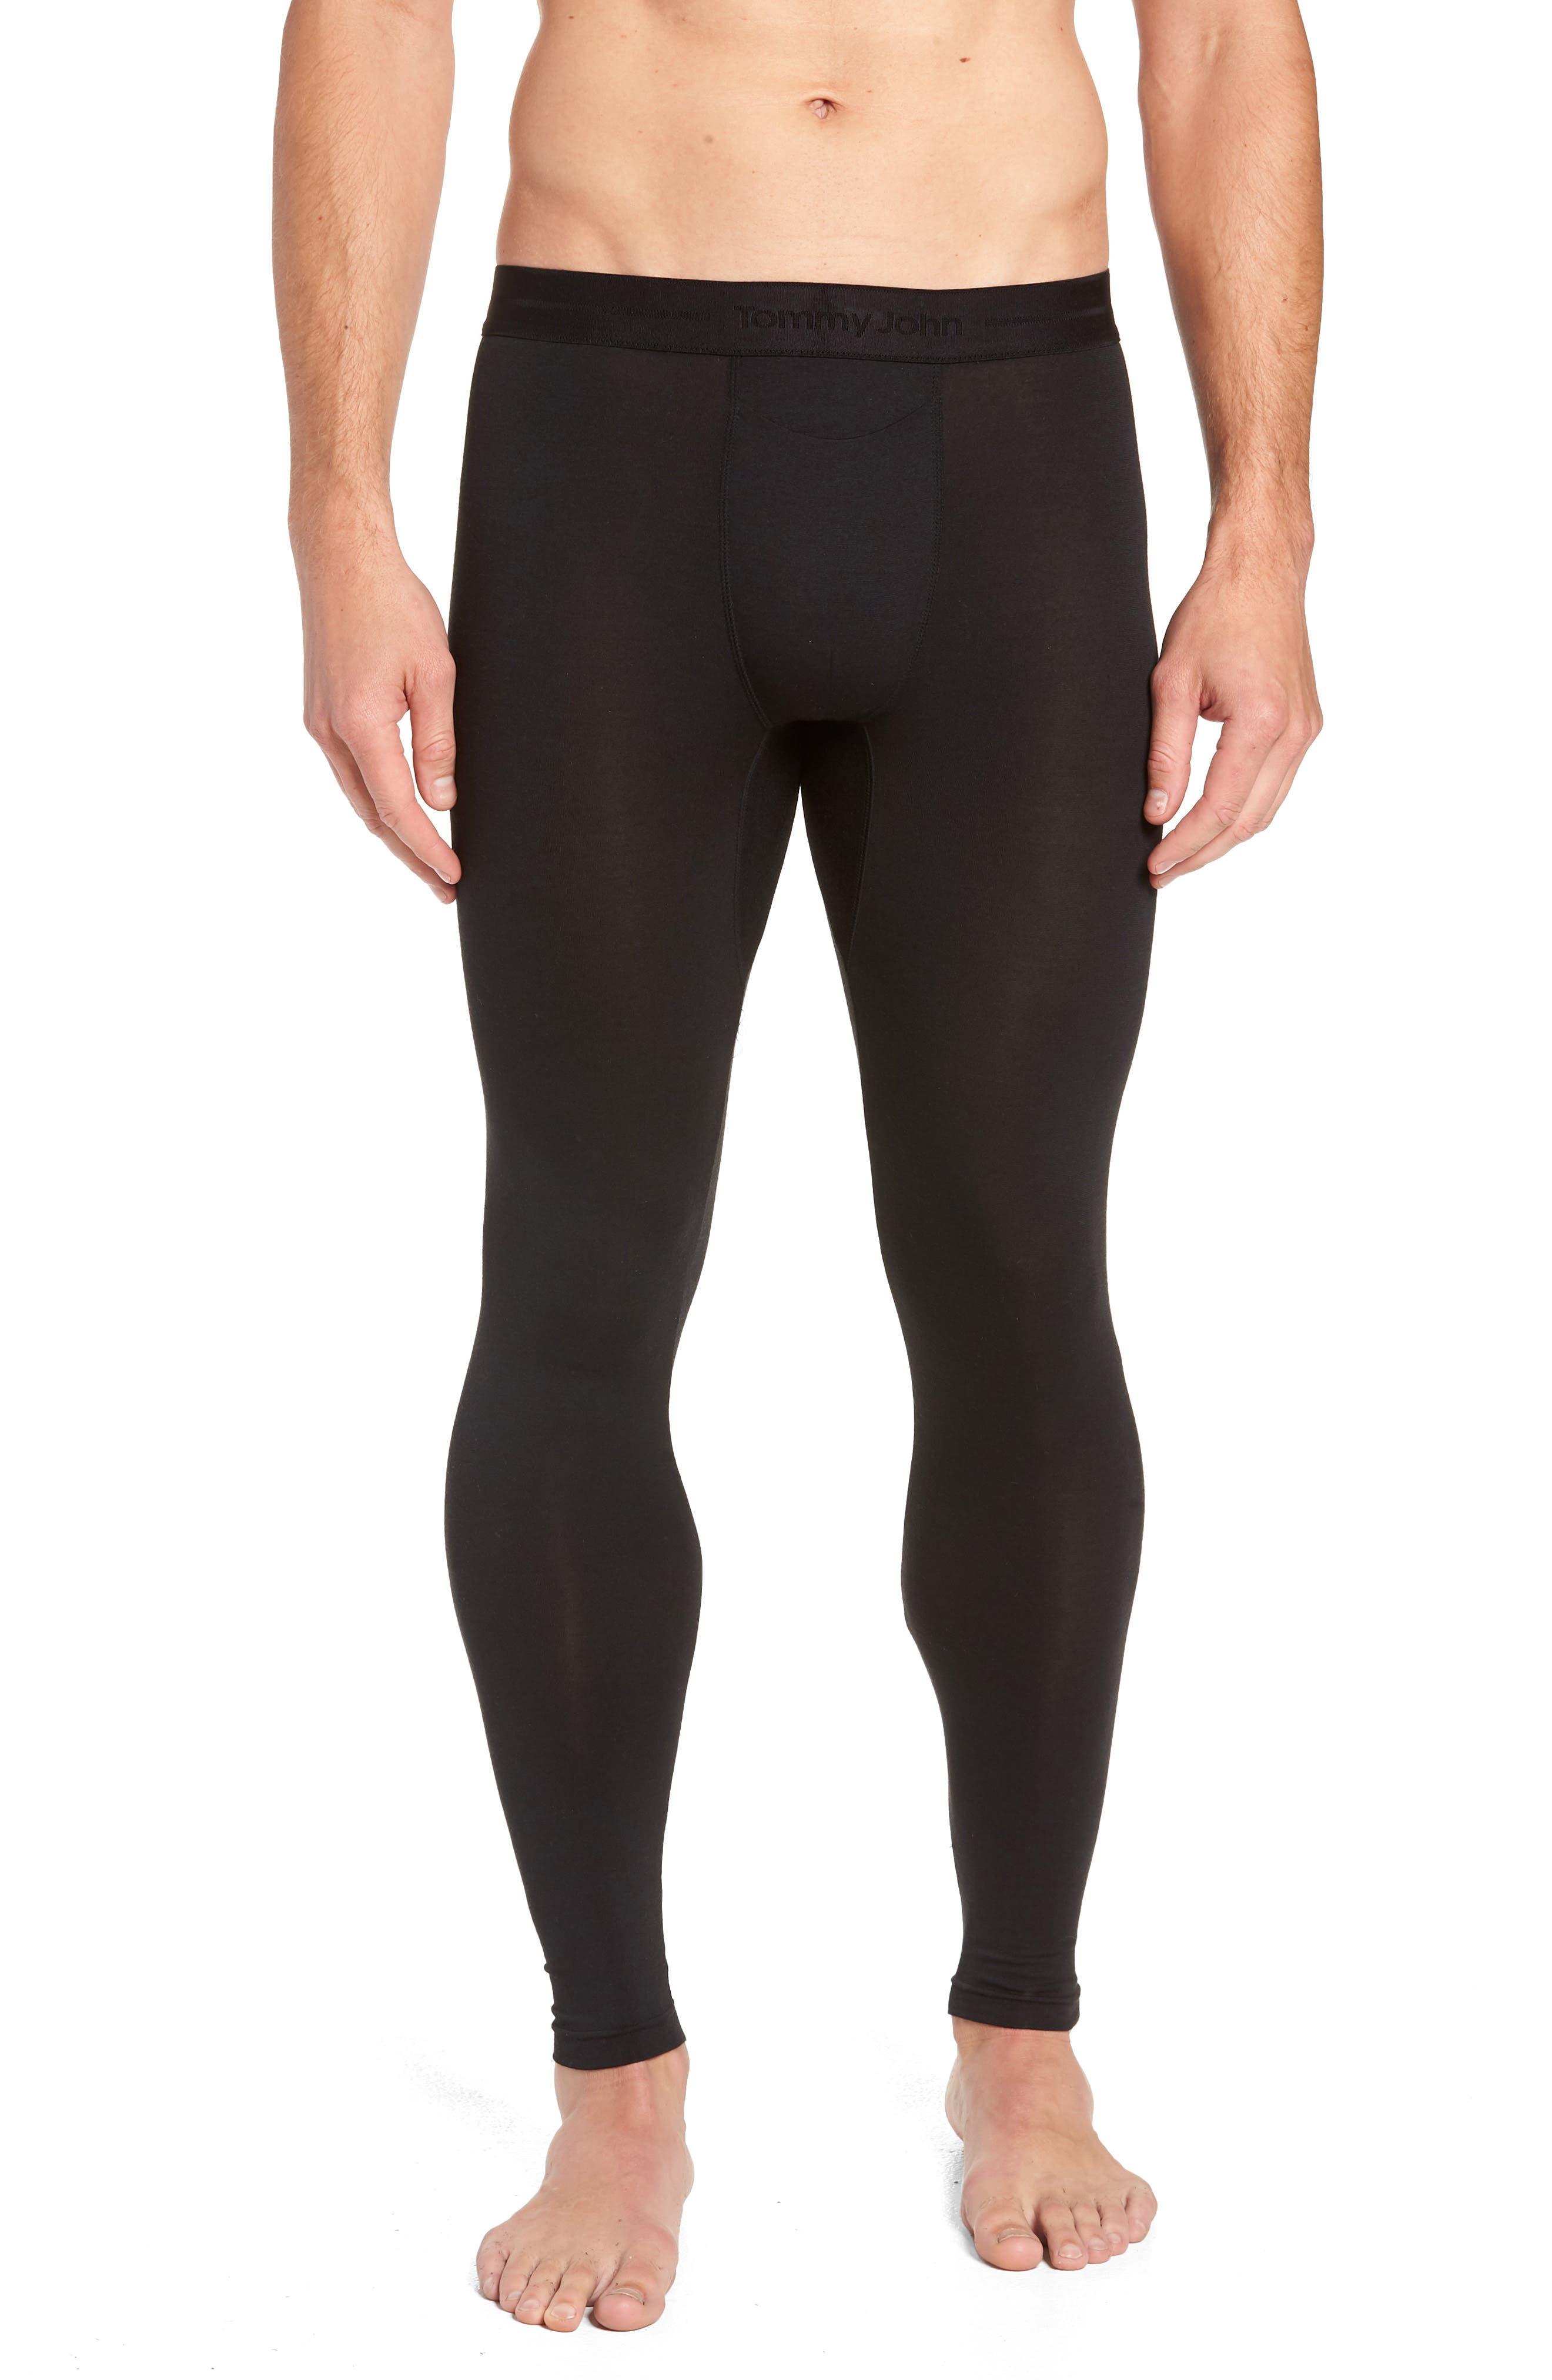 Tommy  John Sleek Heat Leggings,                         Main,                         color, BLACK